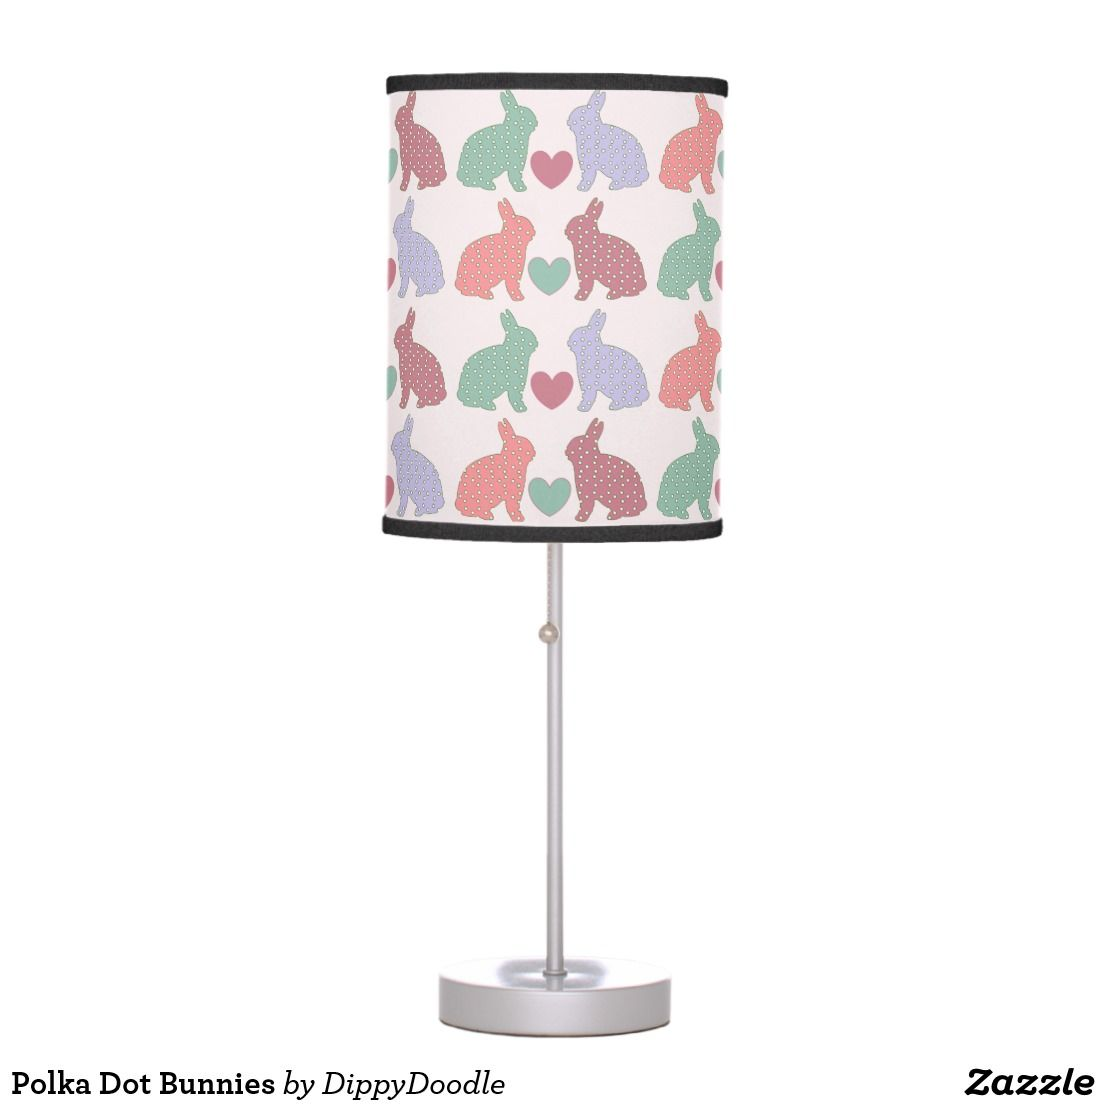 Polka Dot Bunnies Desk Lamp